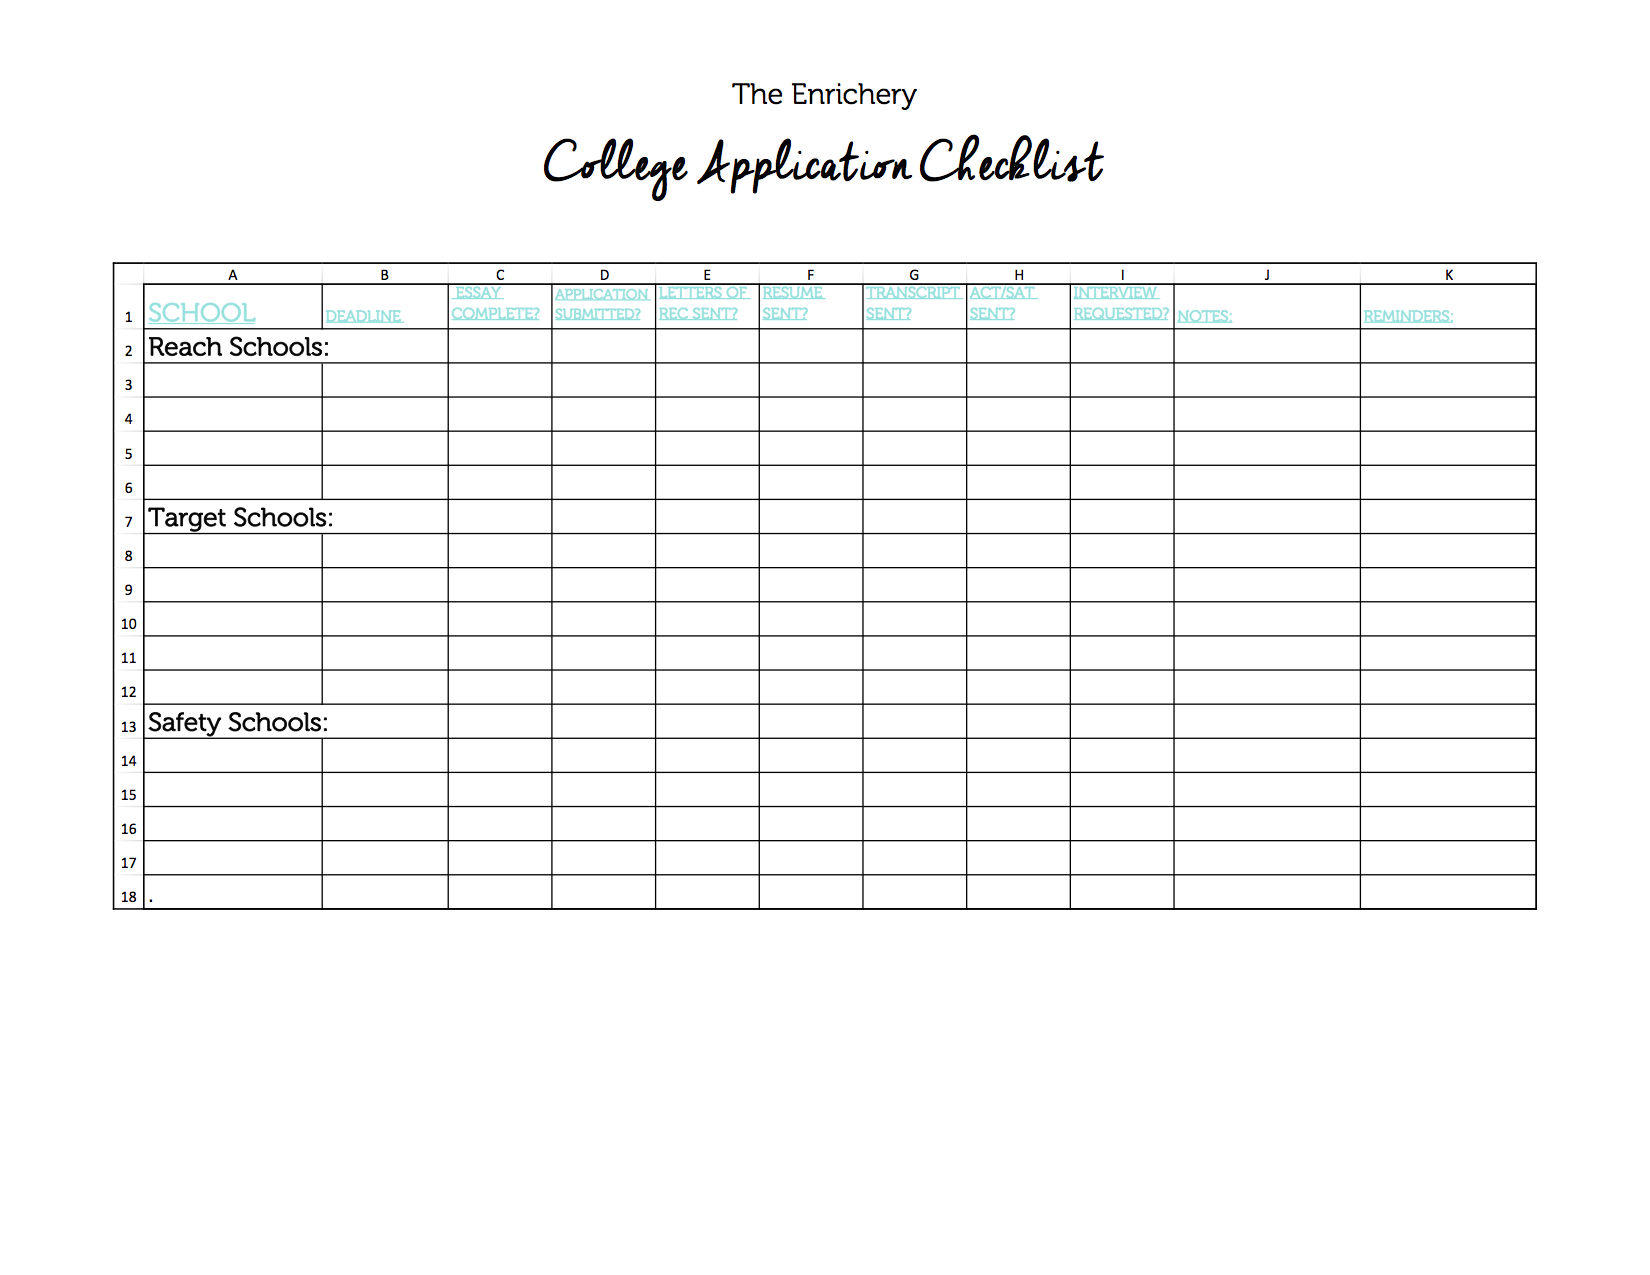 Blank-College Application-Checklist